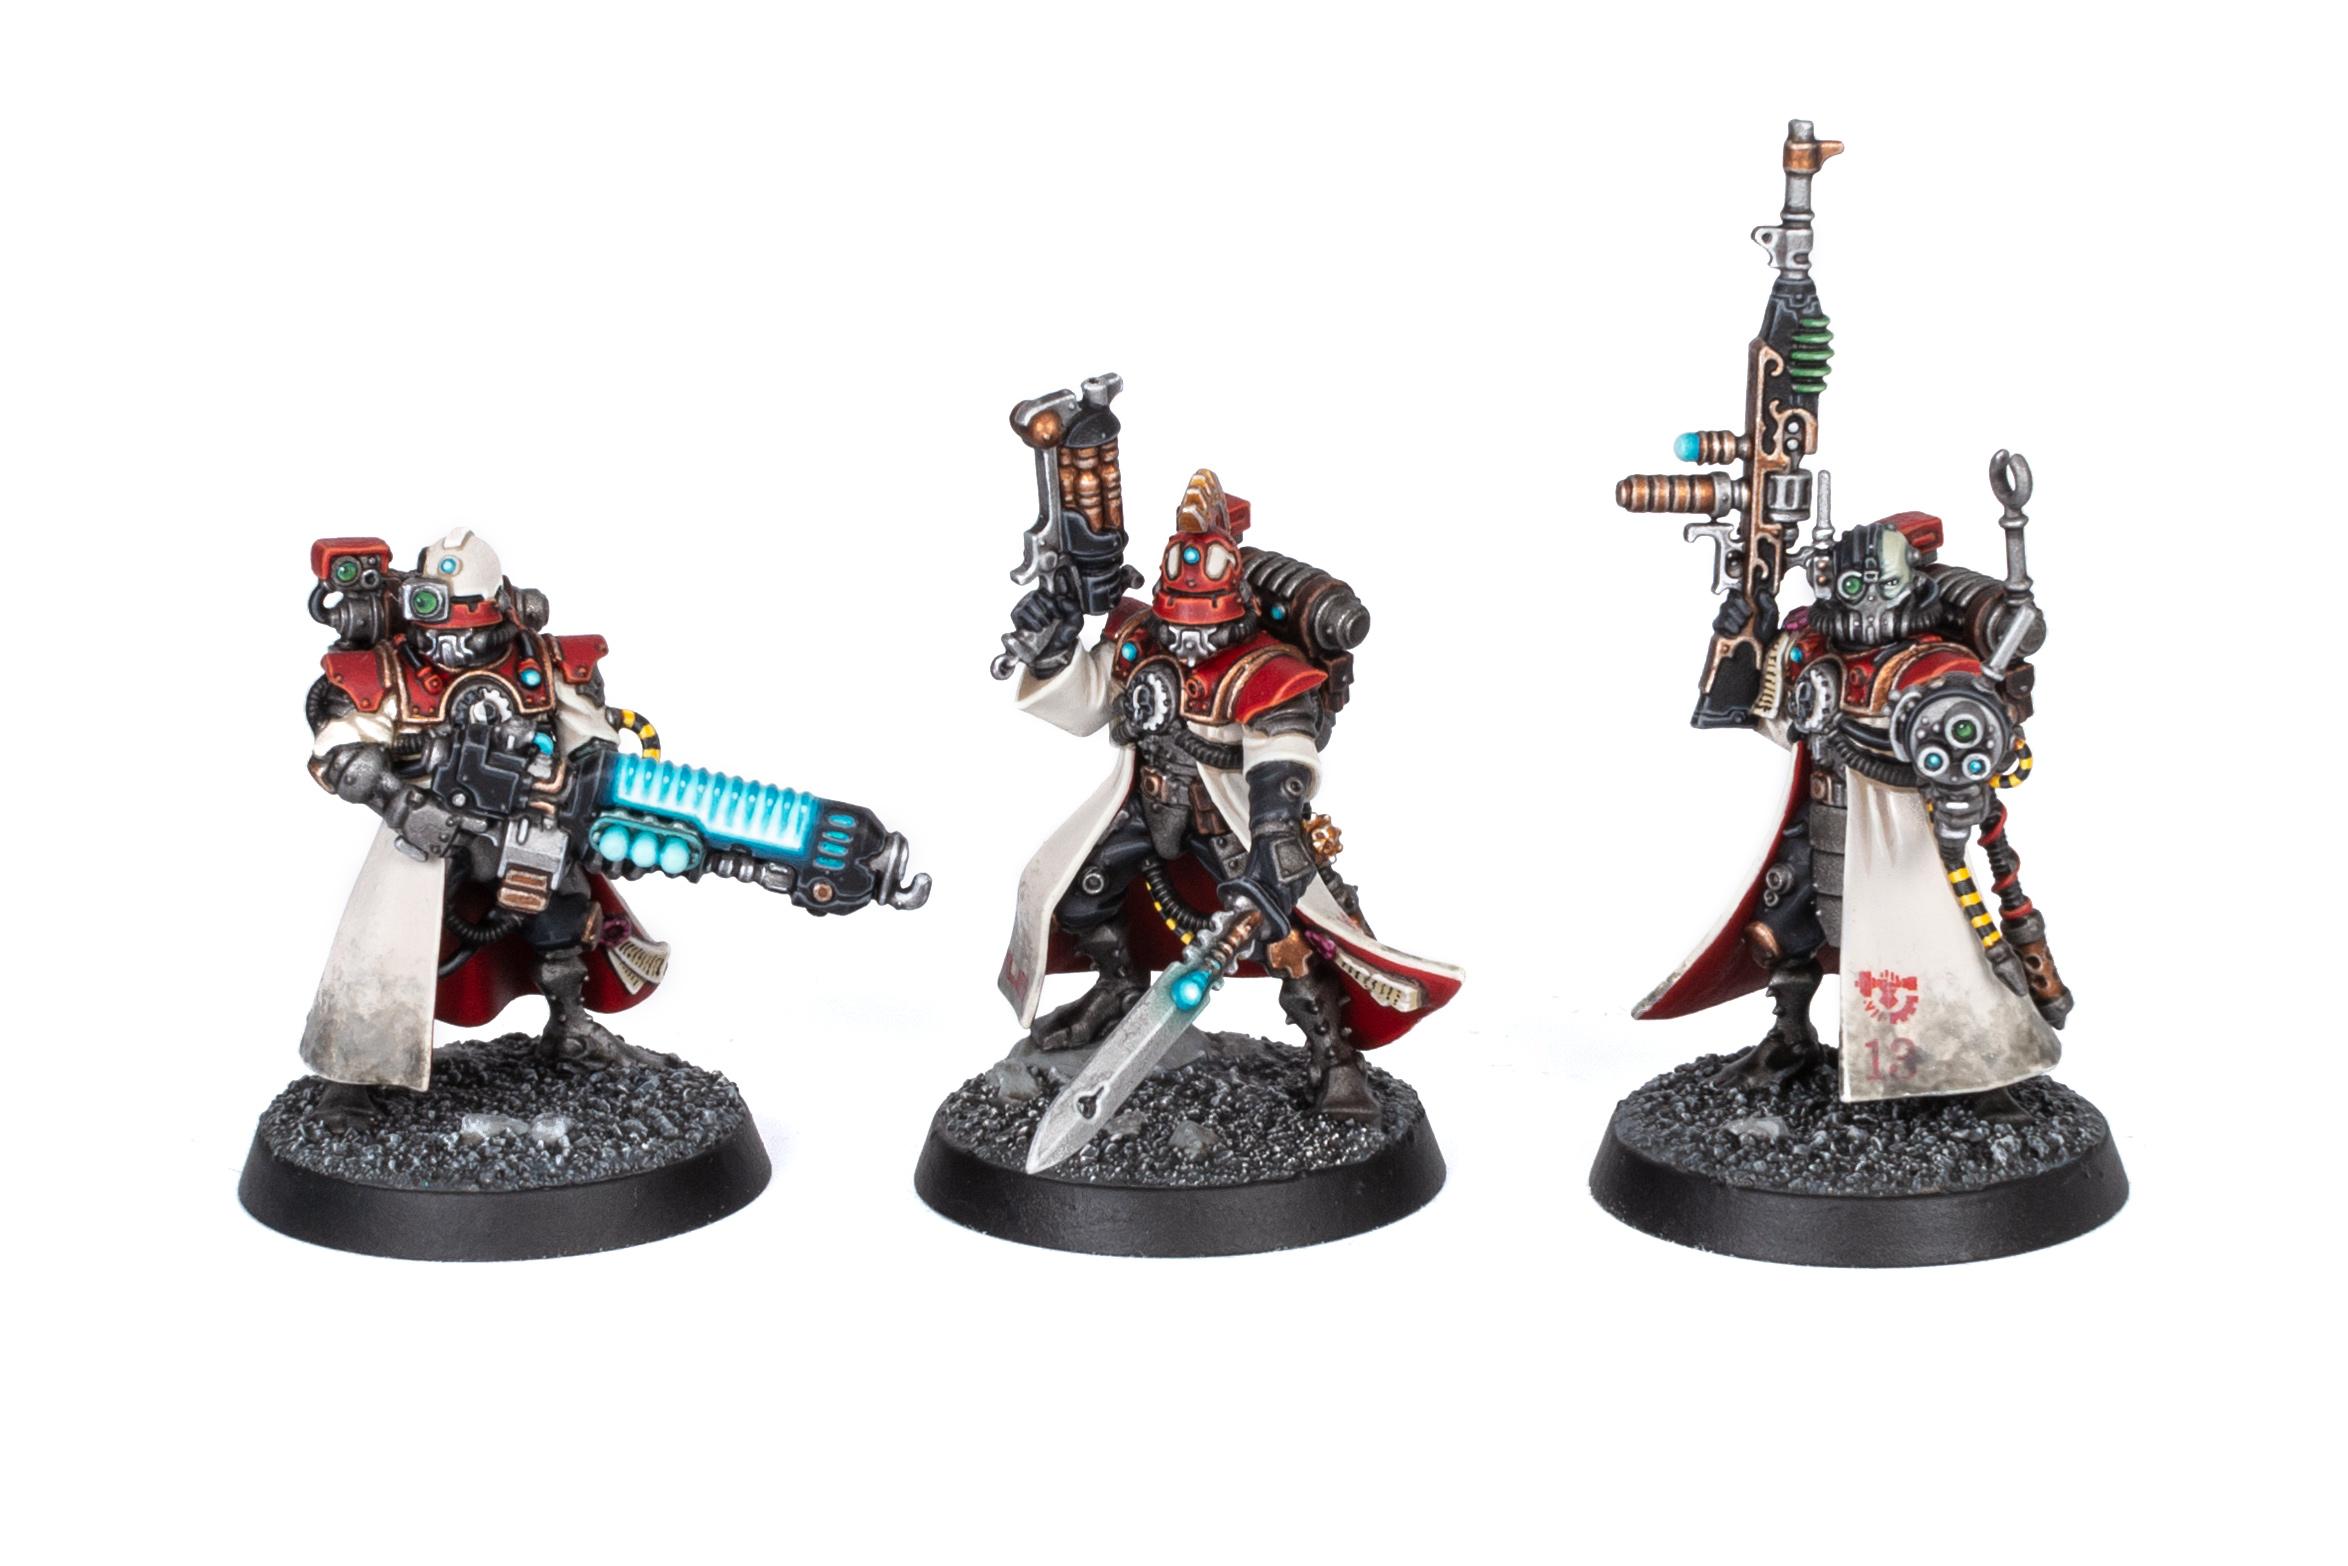 Adeptus Mechanicus Kill Team Skitarii Vanguard front